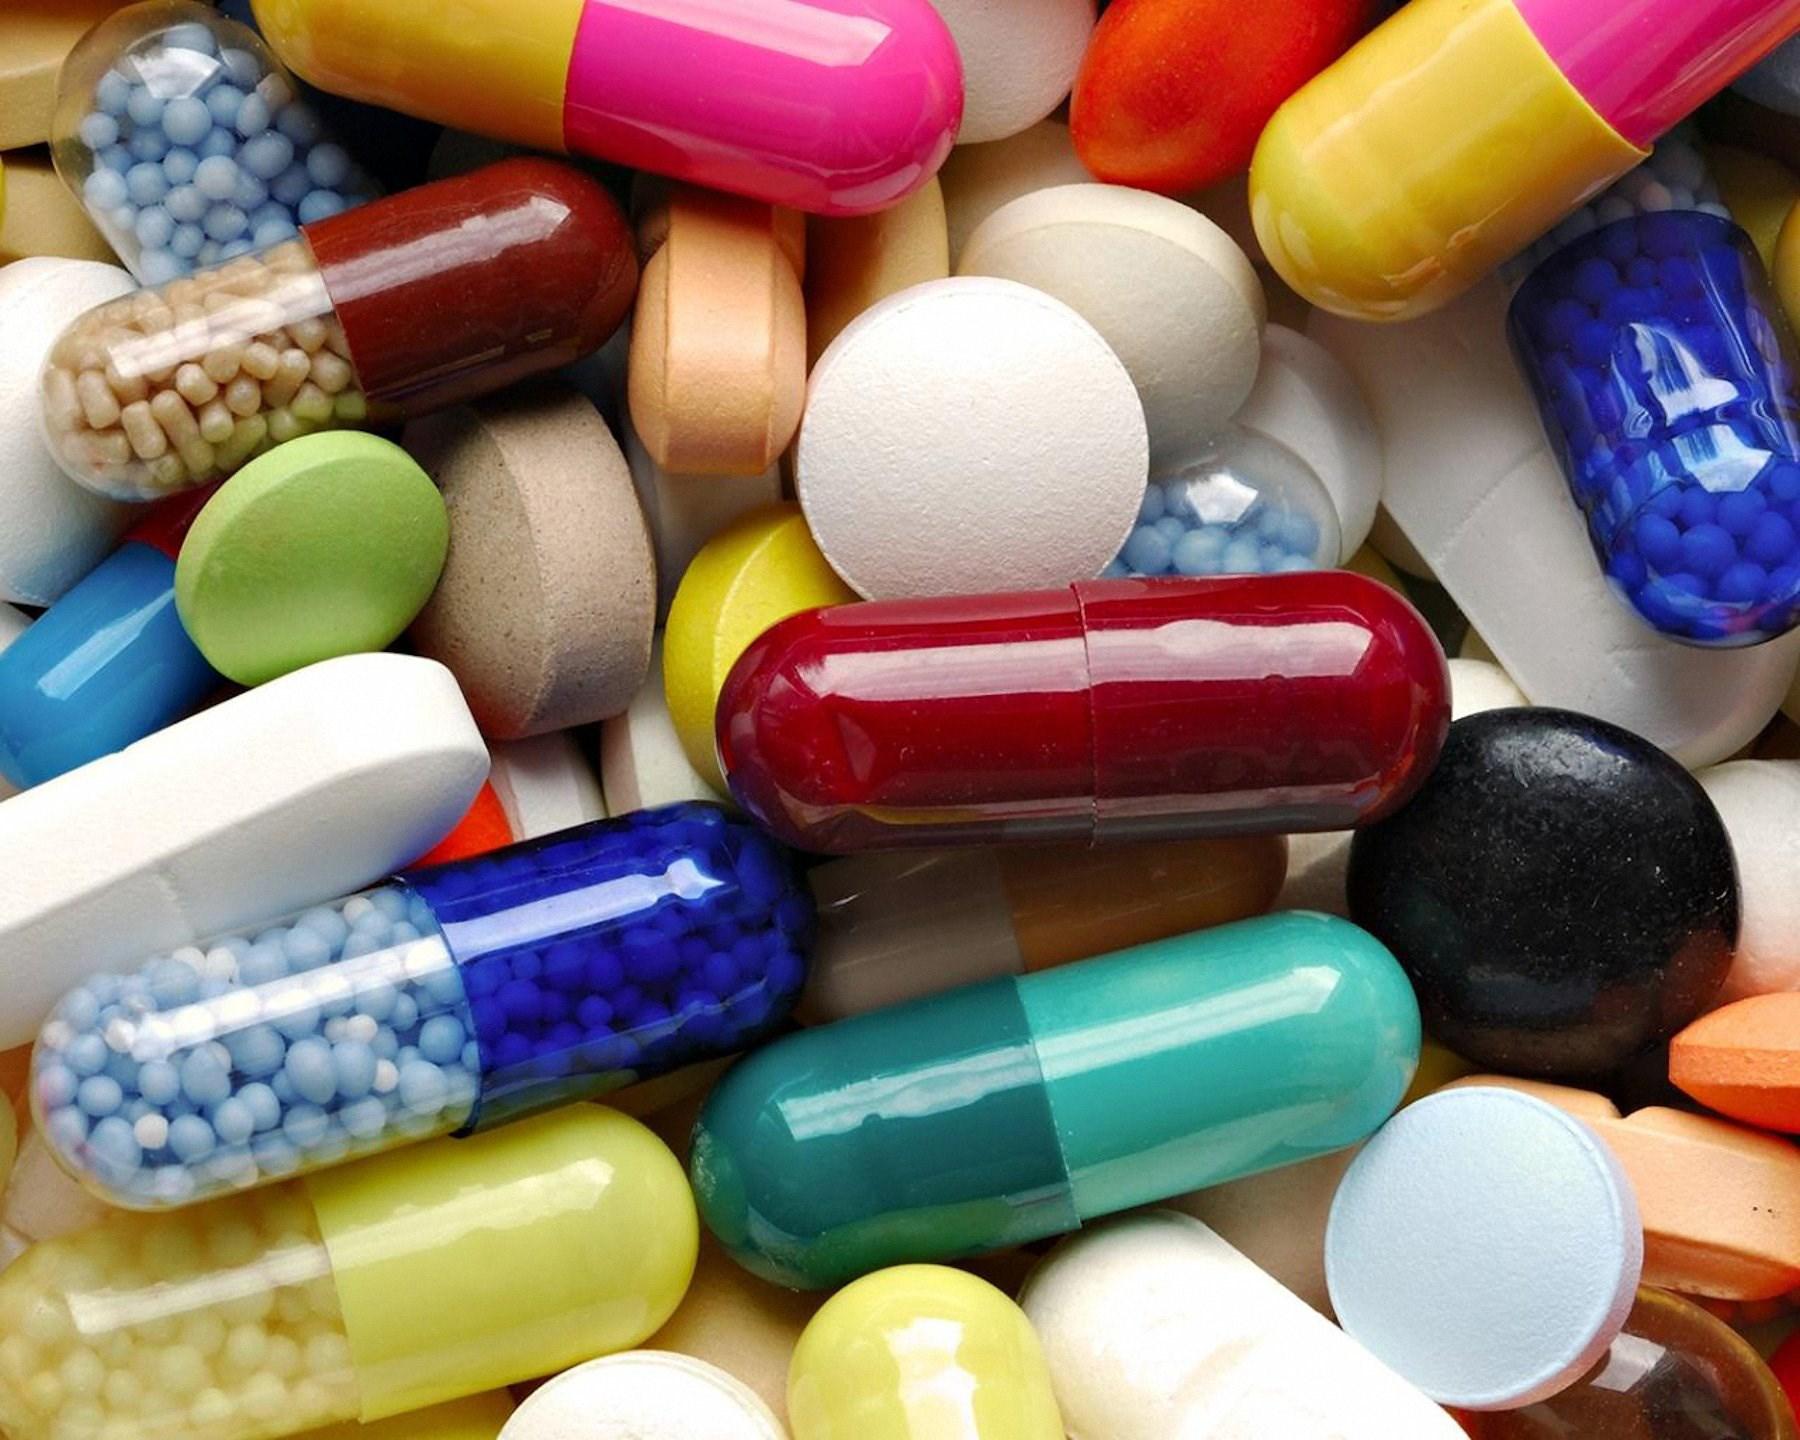 00 pills drugs russia 150915